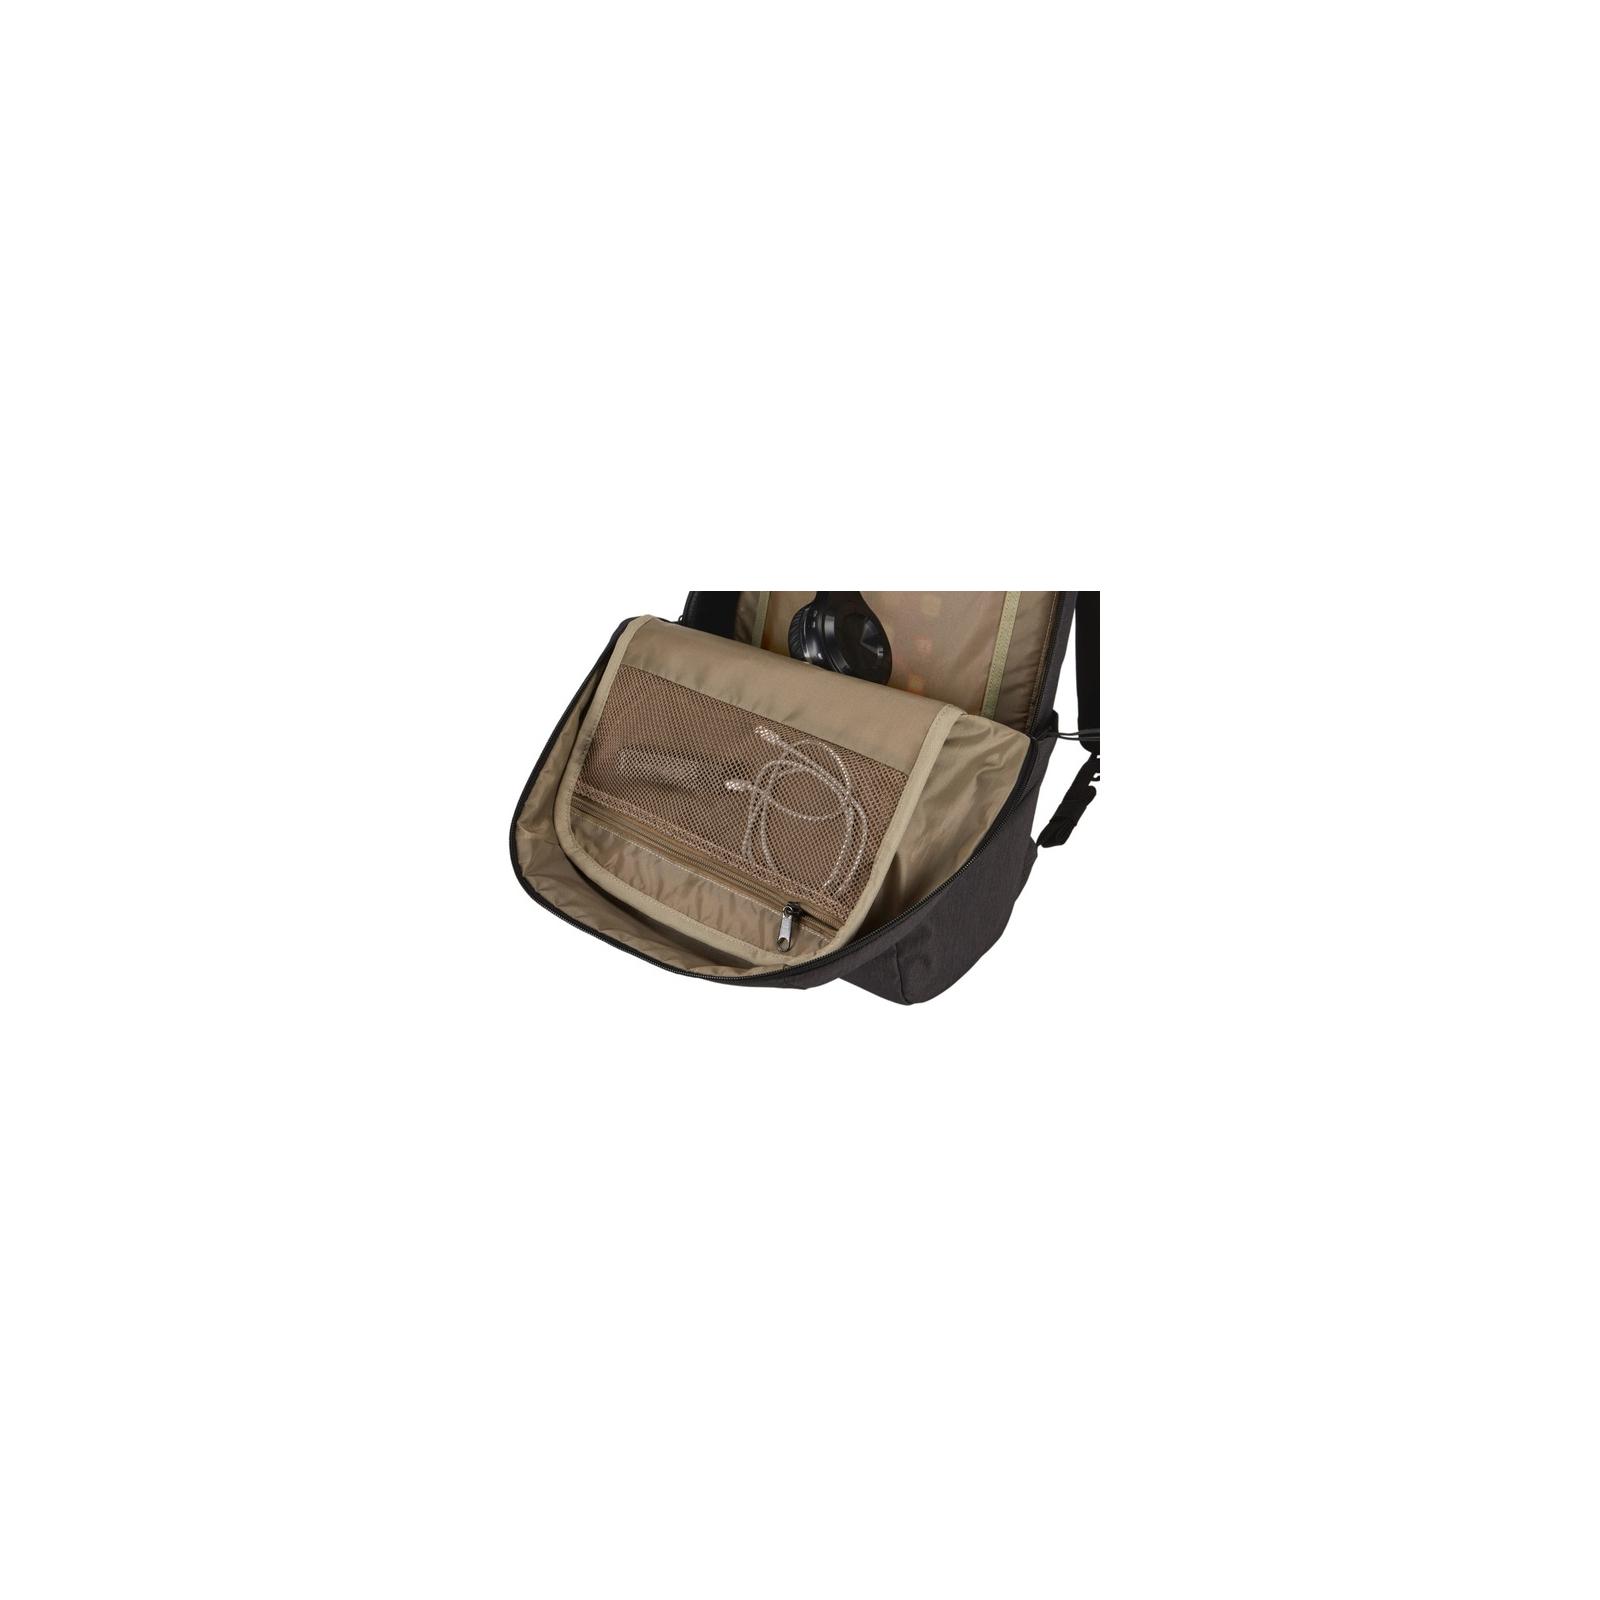 "Рюкзак для ноутбука Thule 15"" Lithos 20L Rooibos/Forest Night TLBP-116 (3203824) изображение 6"